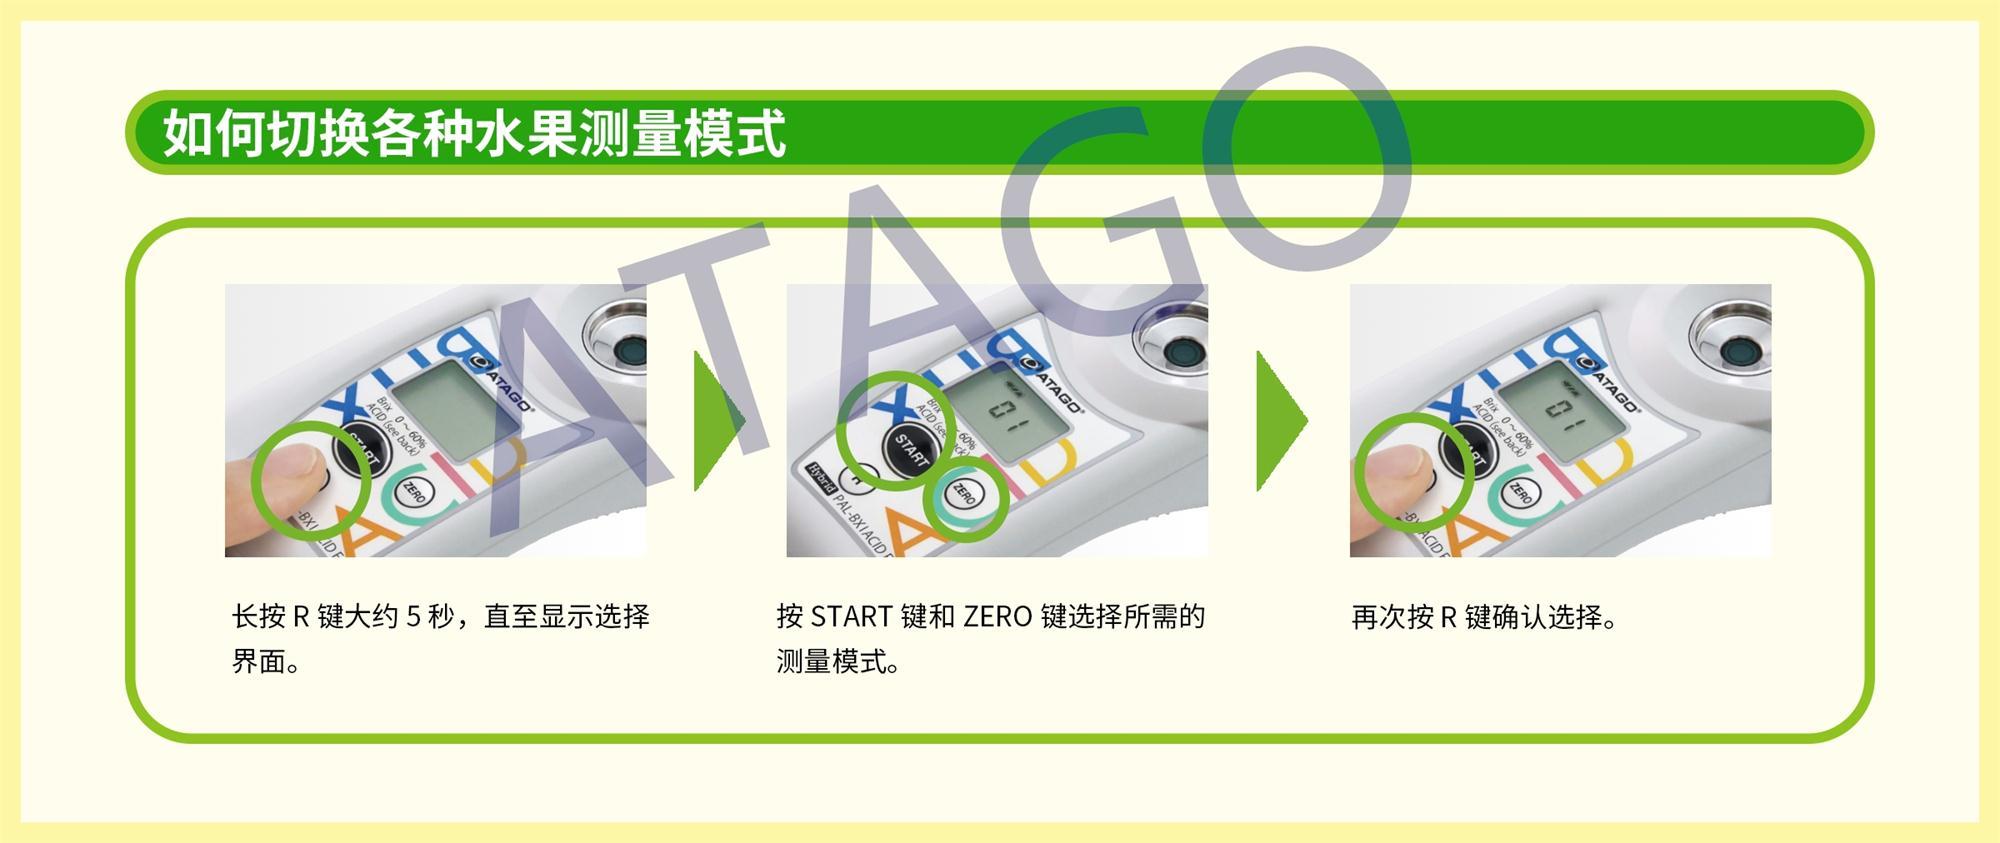 ATAGO (爱拓)PAL-BX-ACID F5 切换方法(水印).jpg